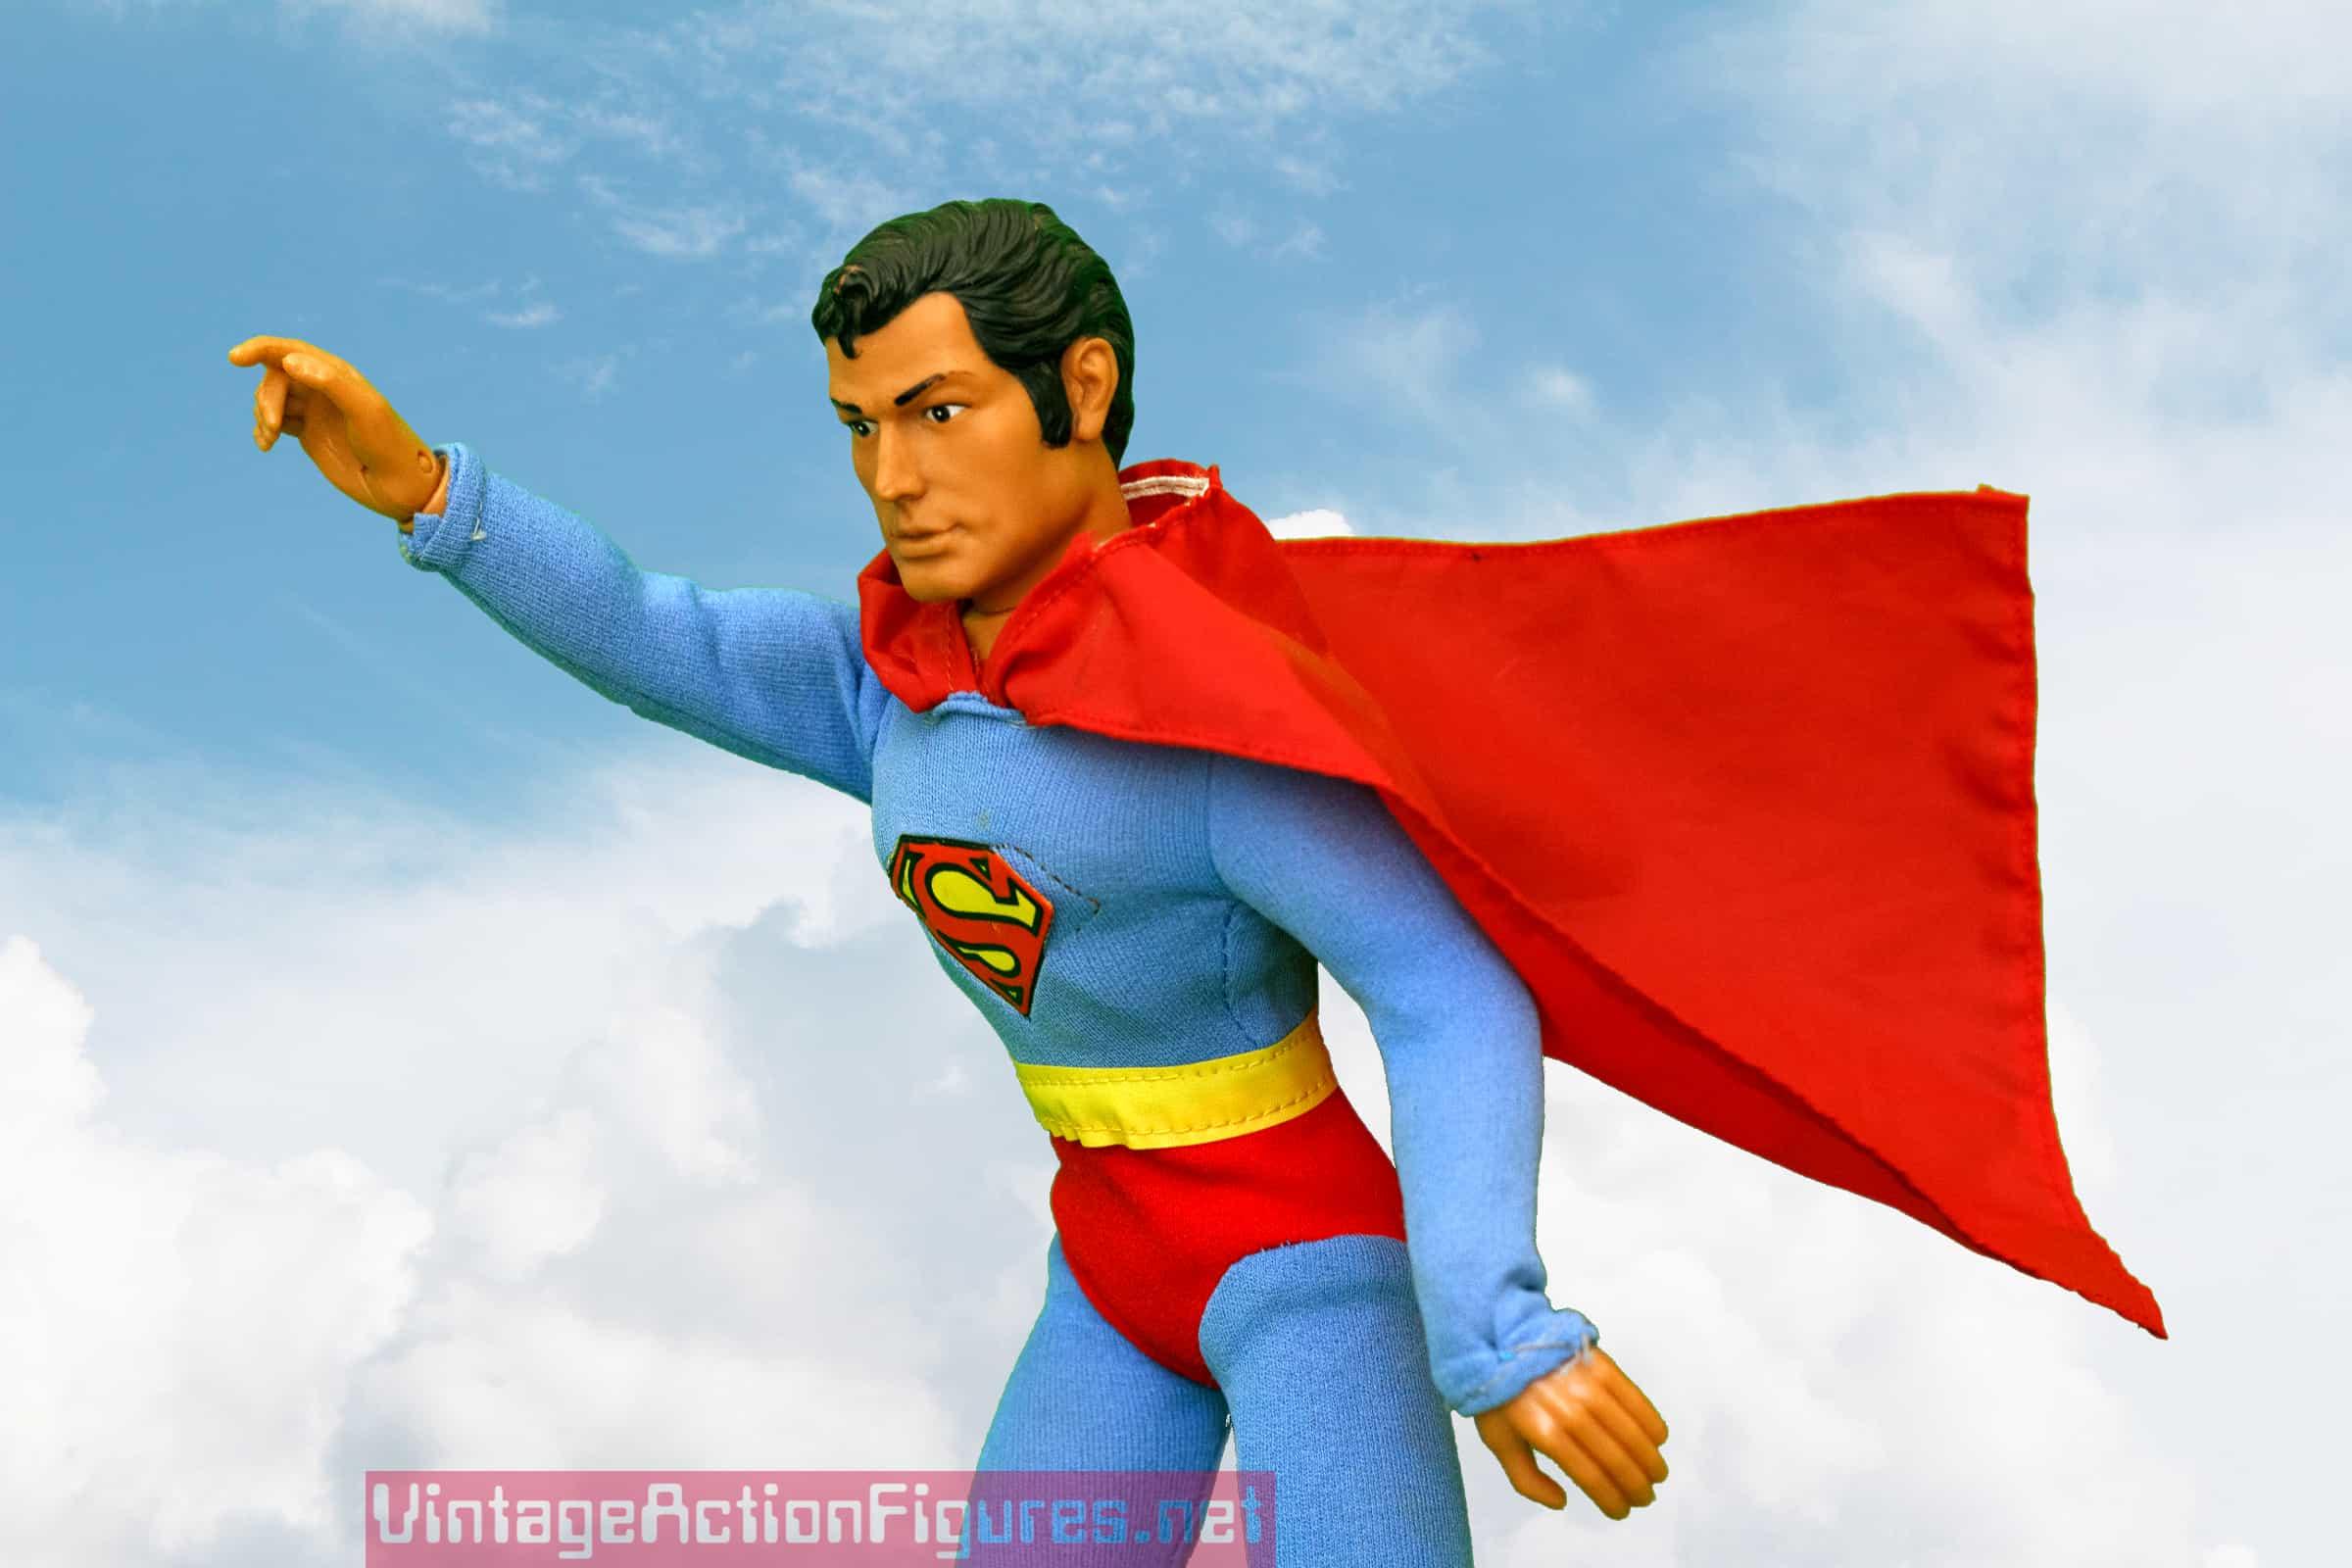 Look! Up in the sky! It's a bird! It's a plane! It's Superman!